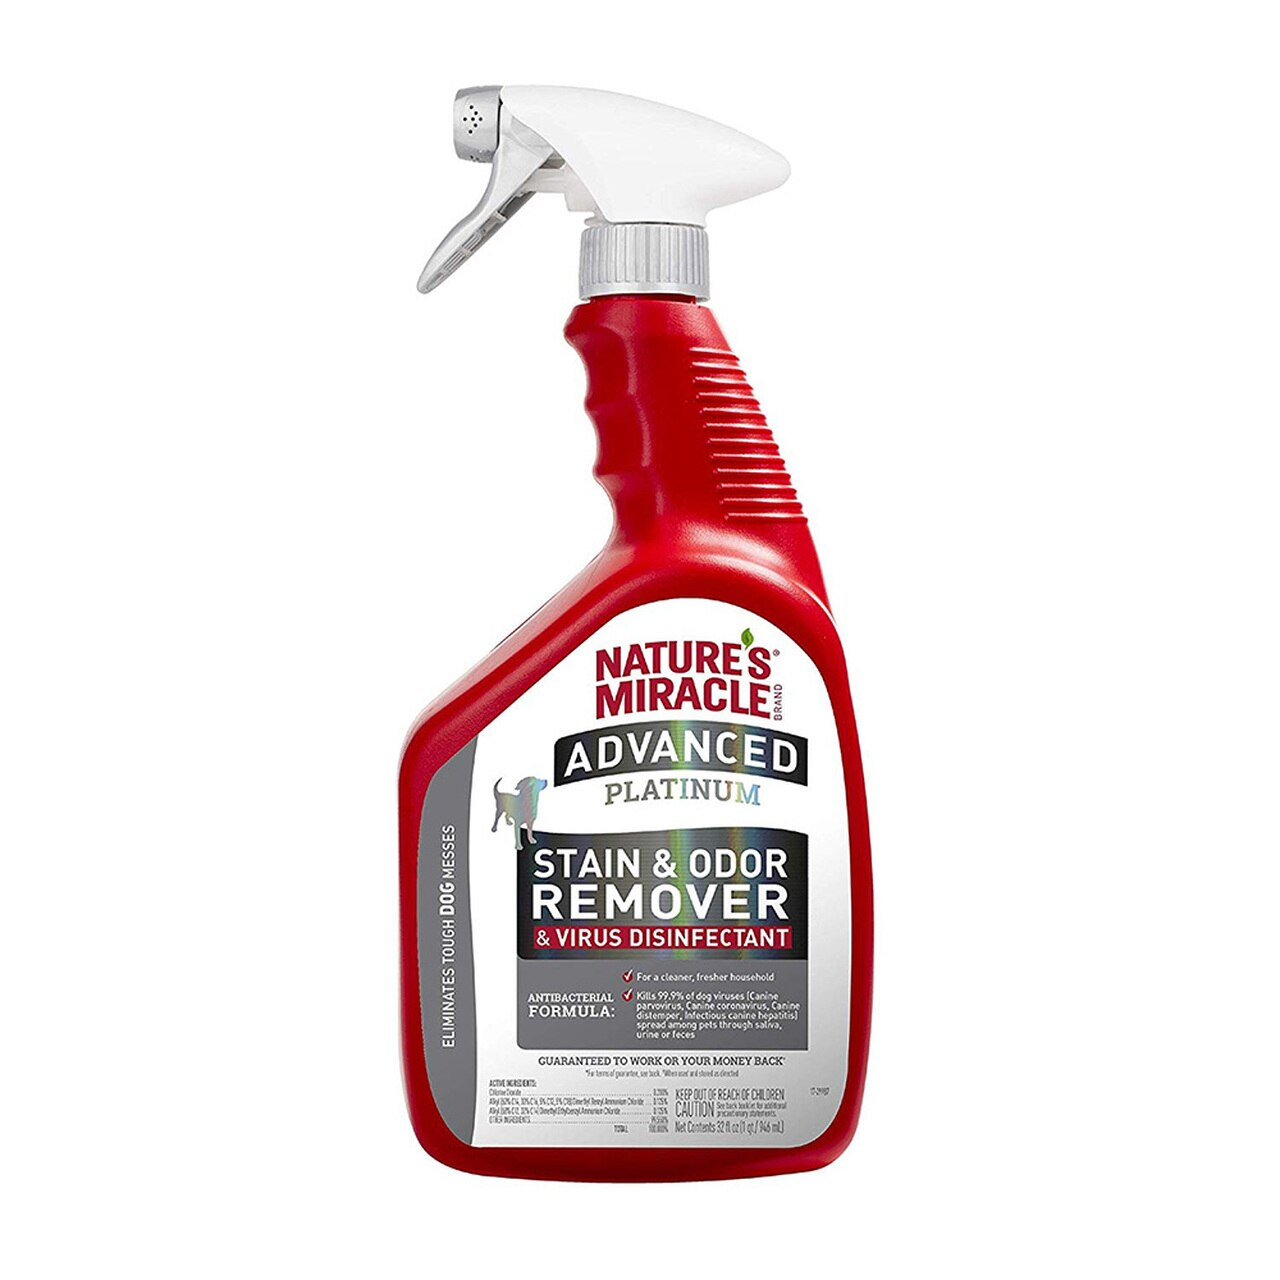 Nature's Miracle Advanced Platinum Dog Stain & Odor Eliminator Spray Image